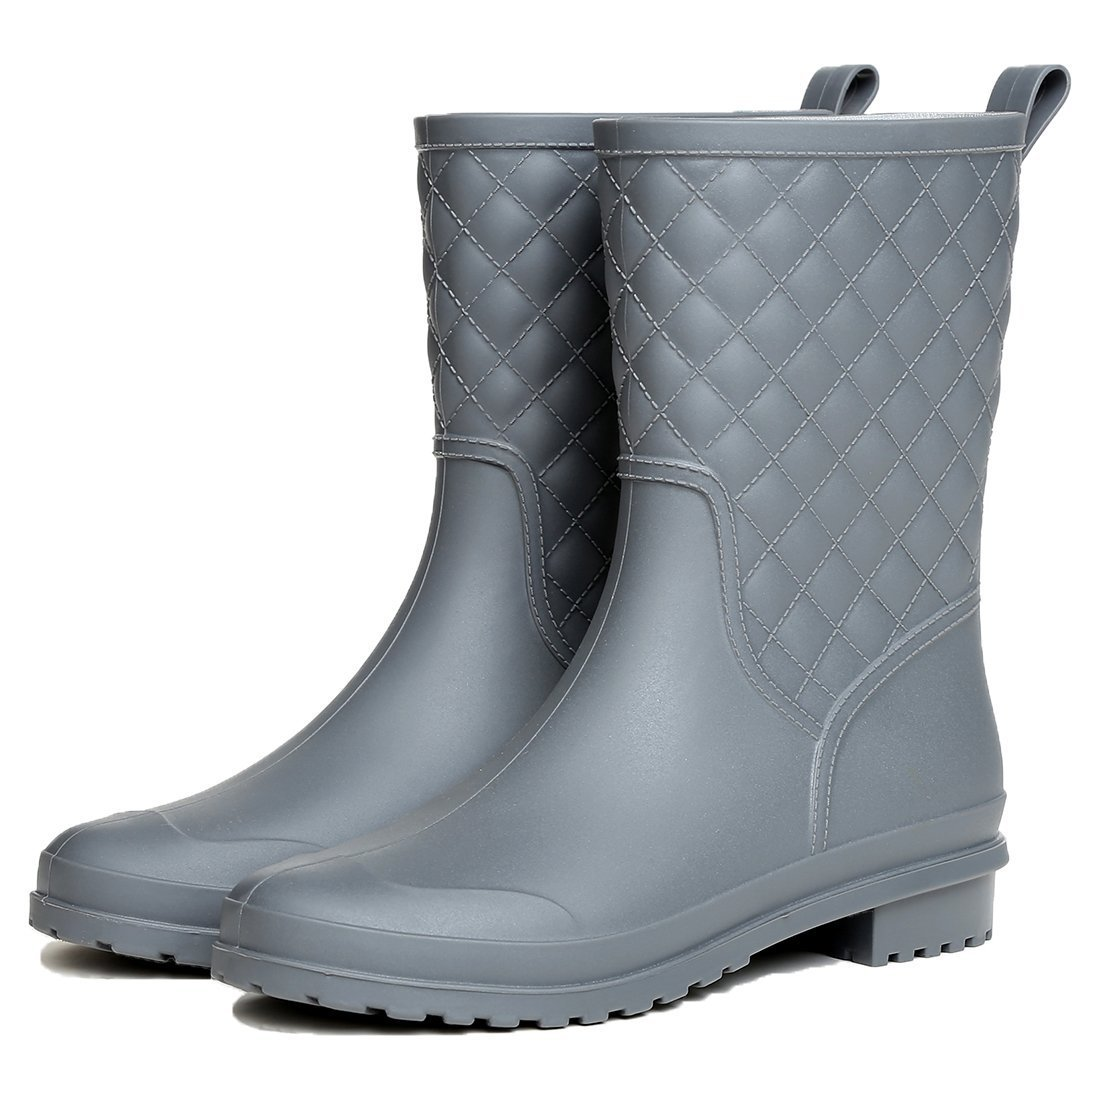 Litfun Womens Black Mid Calf Rain Boots Outdoor Work Waterproof Garden Booties Wide Calf Rain Shoes